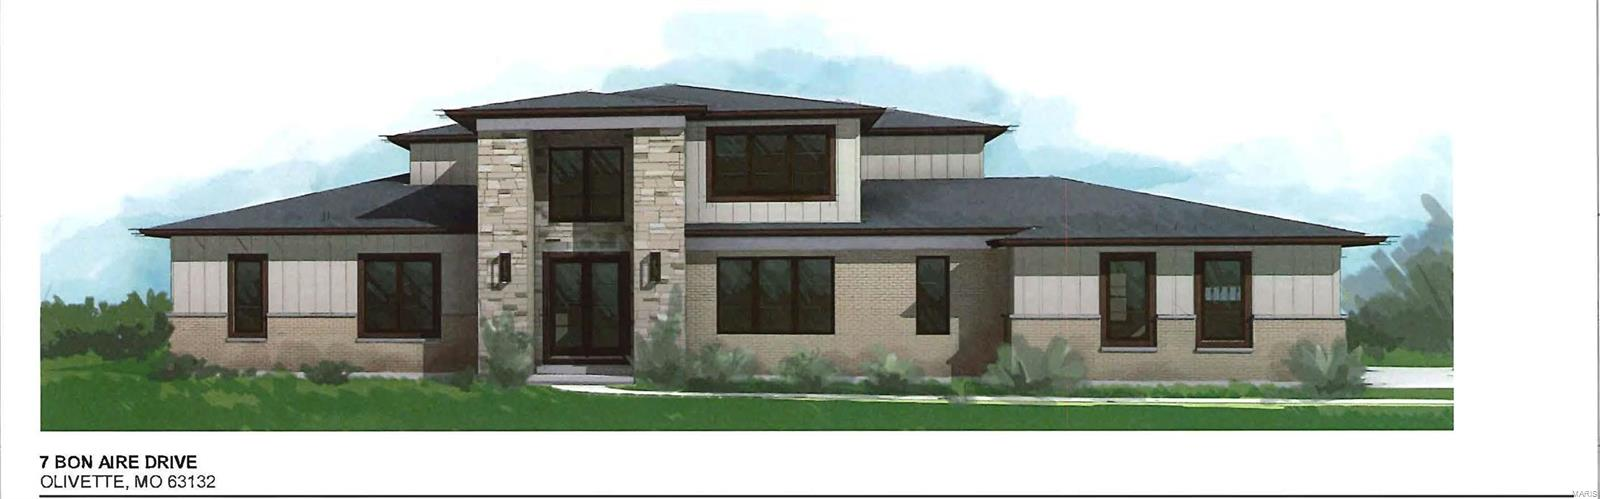 7 Bon Aire Drive Property Photo - St Louis, MO real estate listing